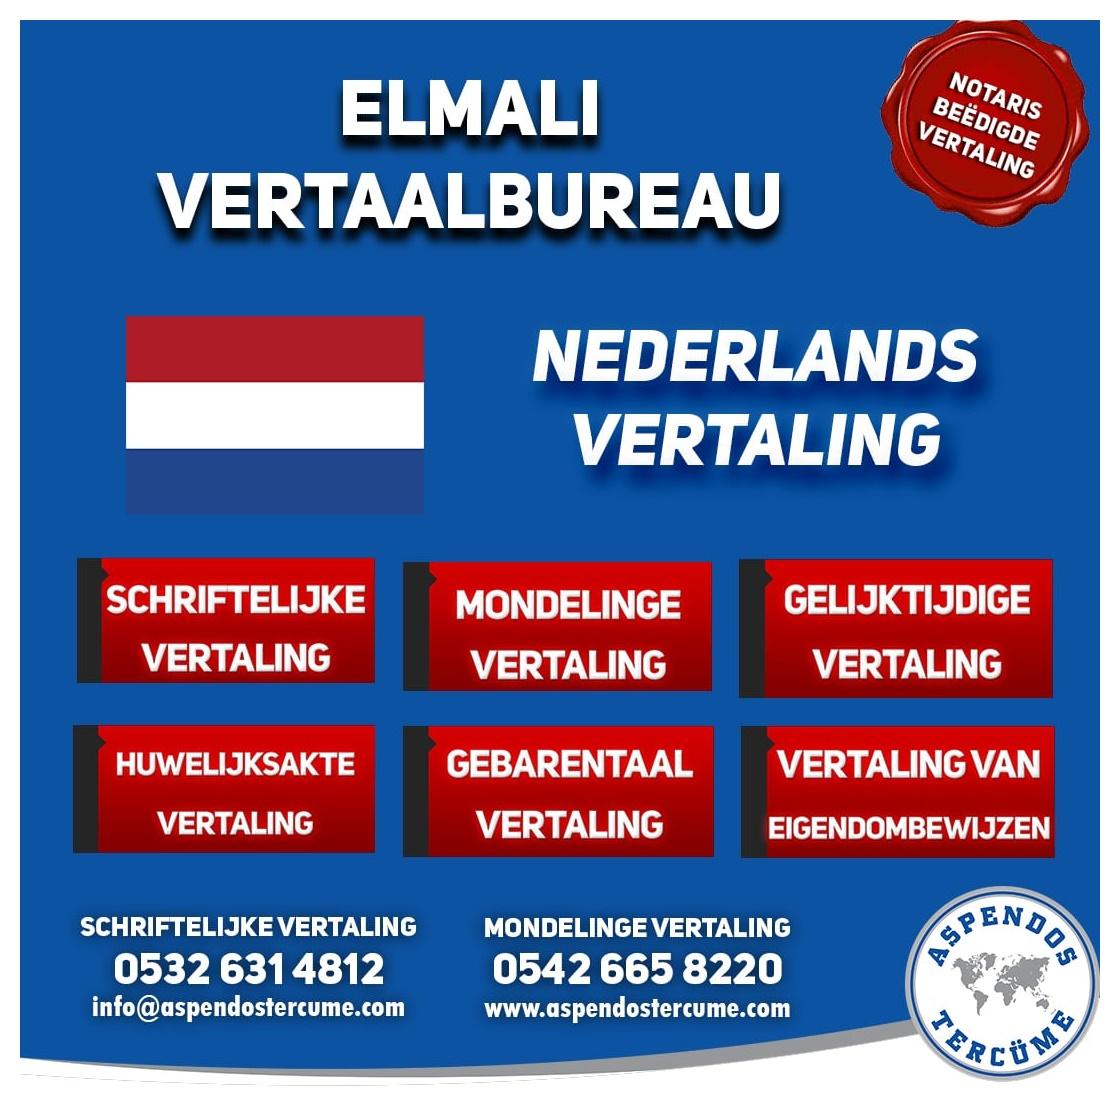 elmali_vertaalbureau nederlandse vertaling_NL